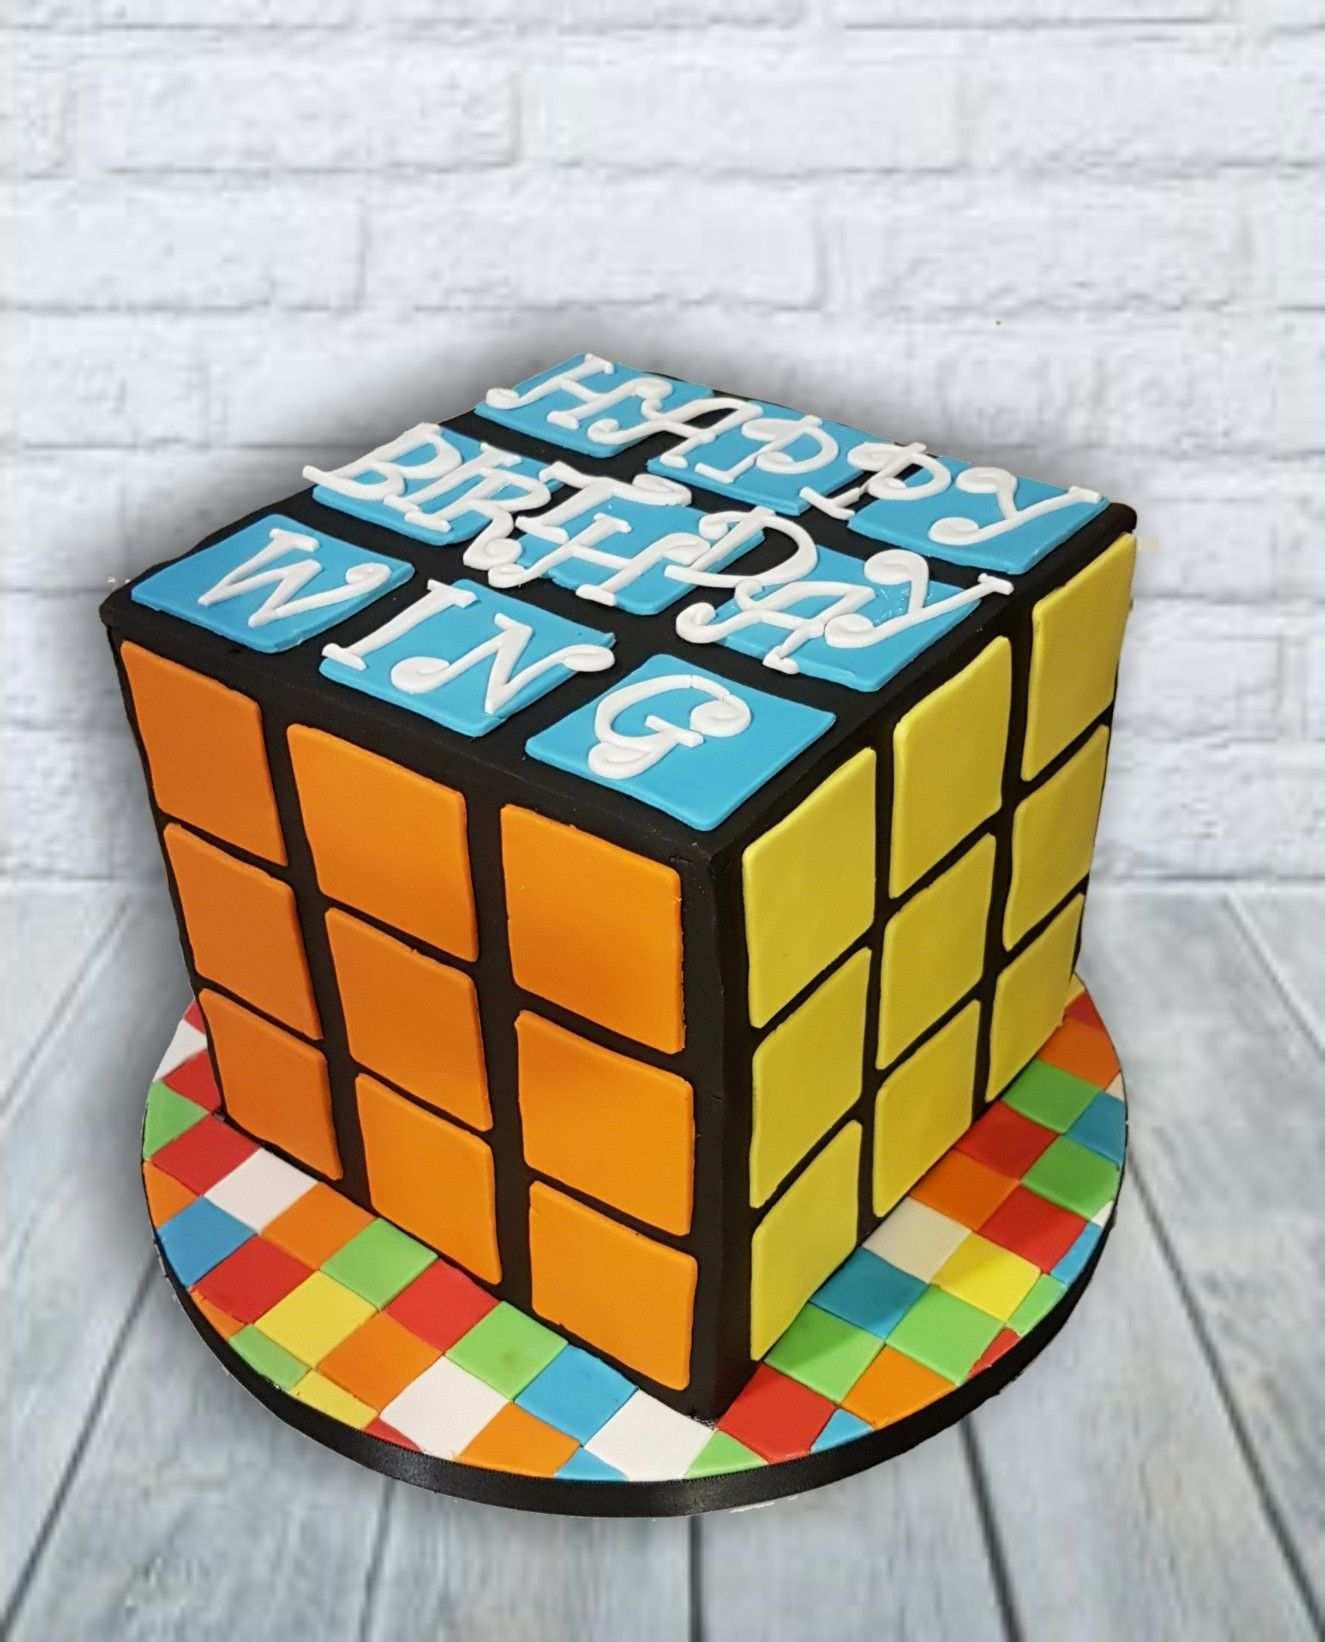 Rubix Cube Chocolate Cake Chocolate Caramel Ganache Tolle Kuchen Kuchen Torten